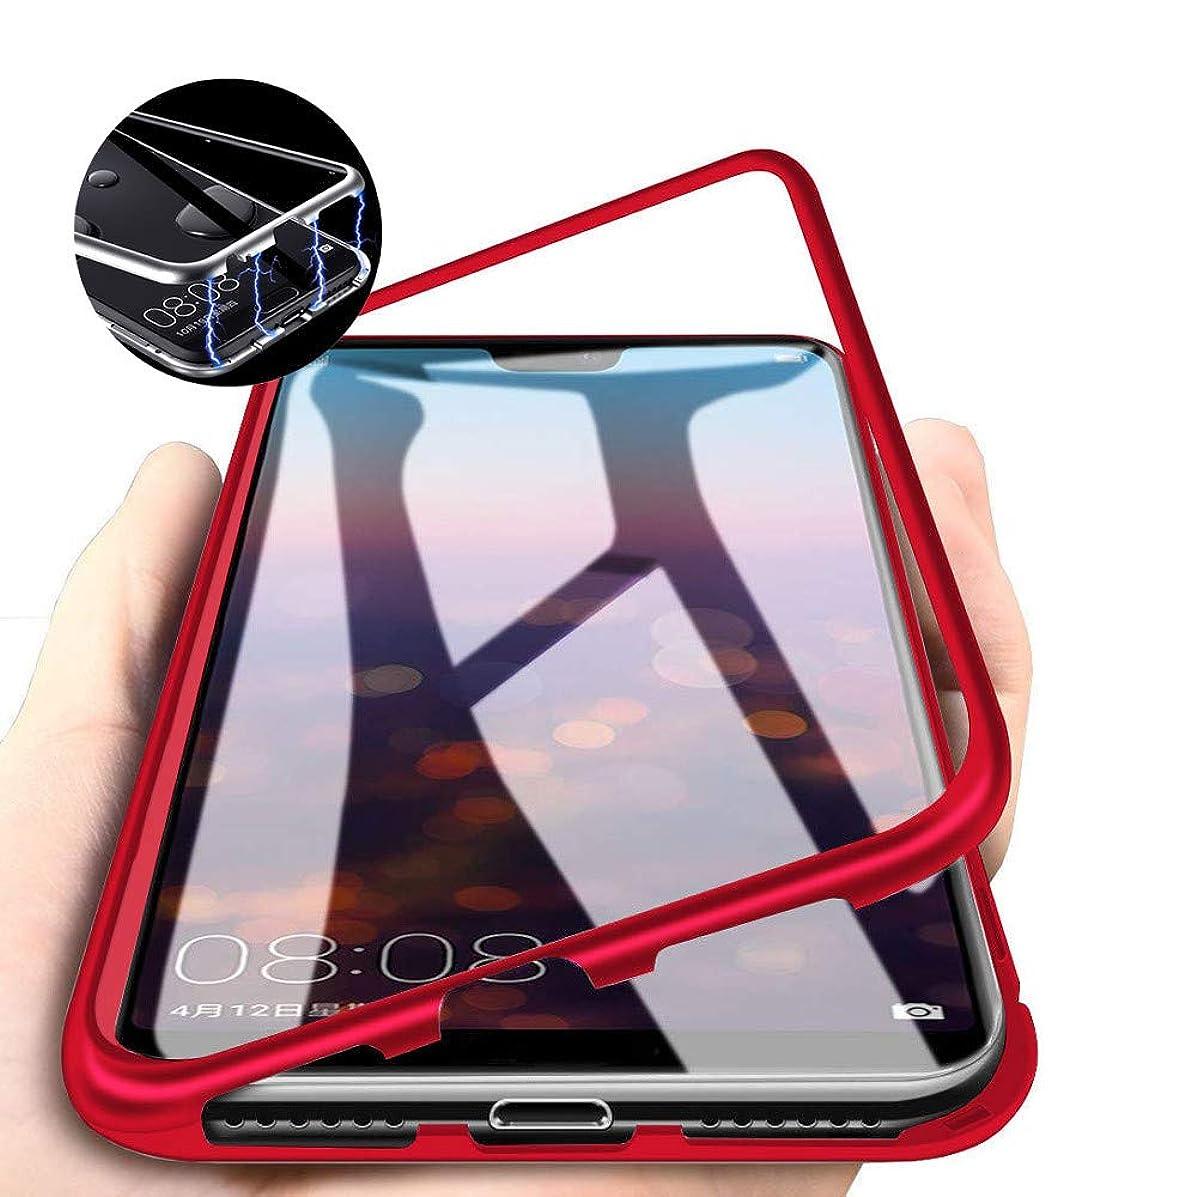 Case Huawei Nova 3 Magnetic Adsorption Tech Strong Magnets Built-in Hybrid Aluminum Frame Back Transparent Tempered Glass Scratch Resistance Shockproof Cover